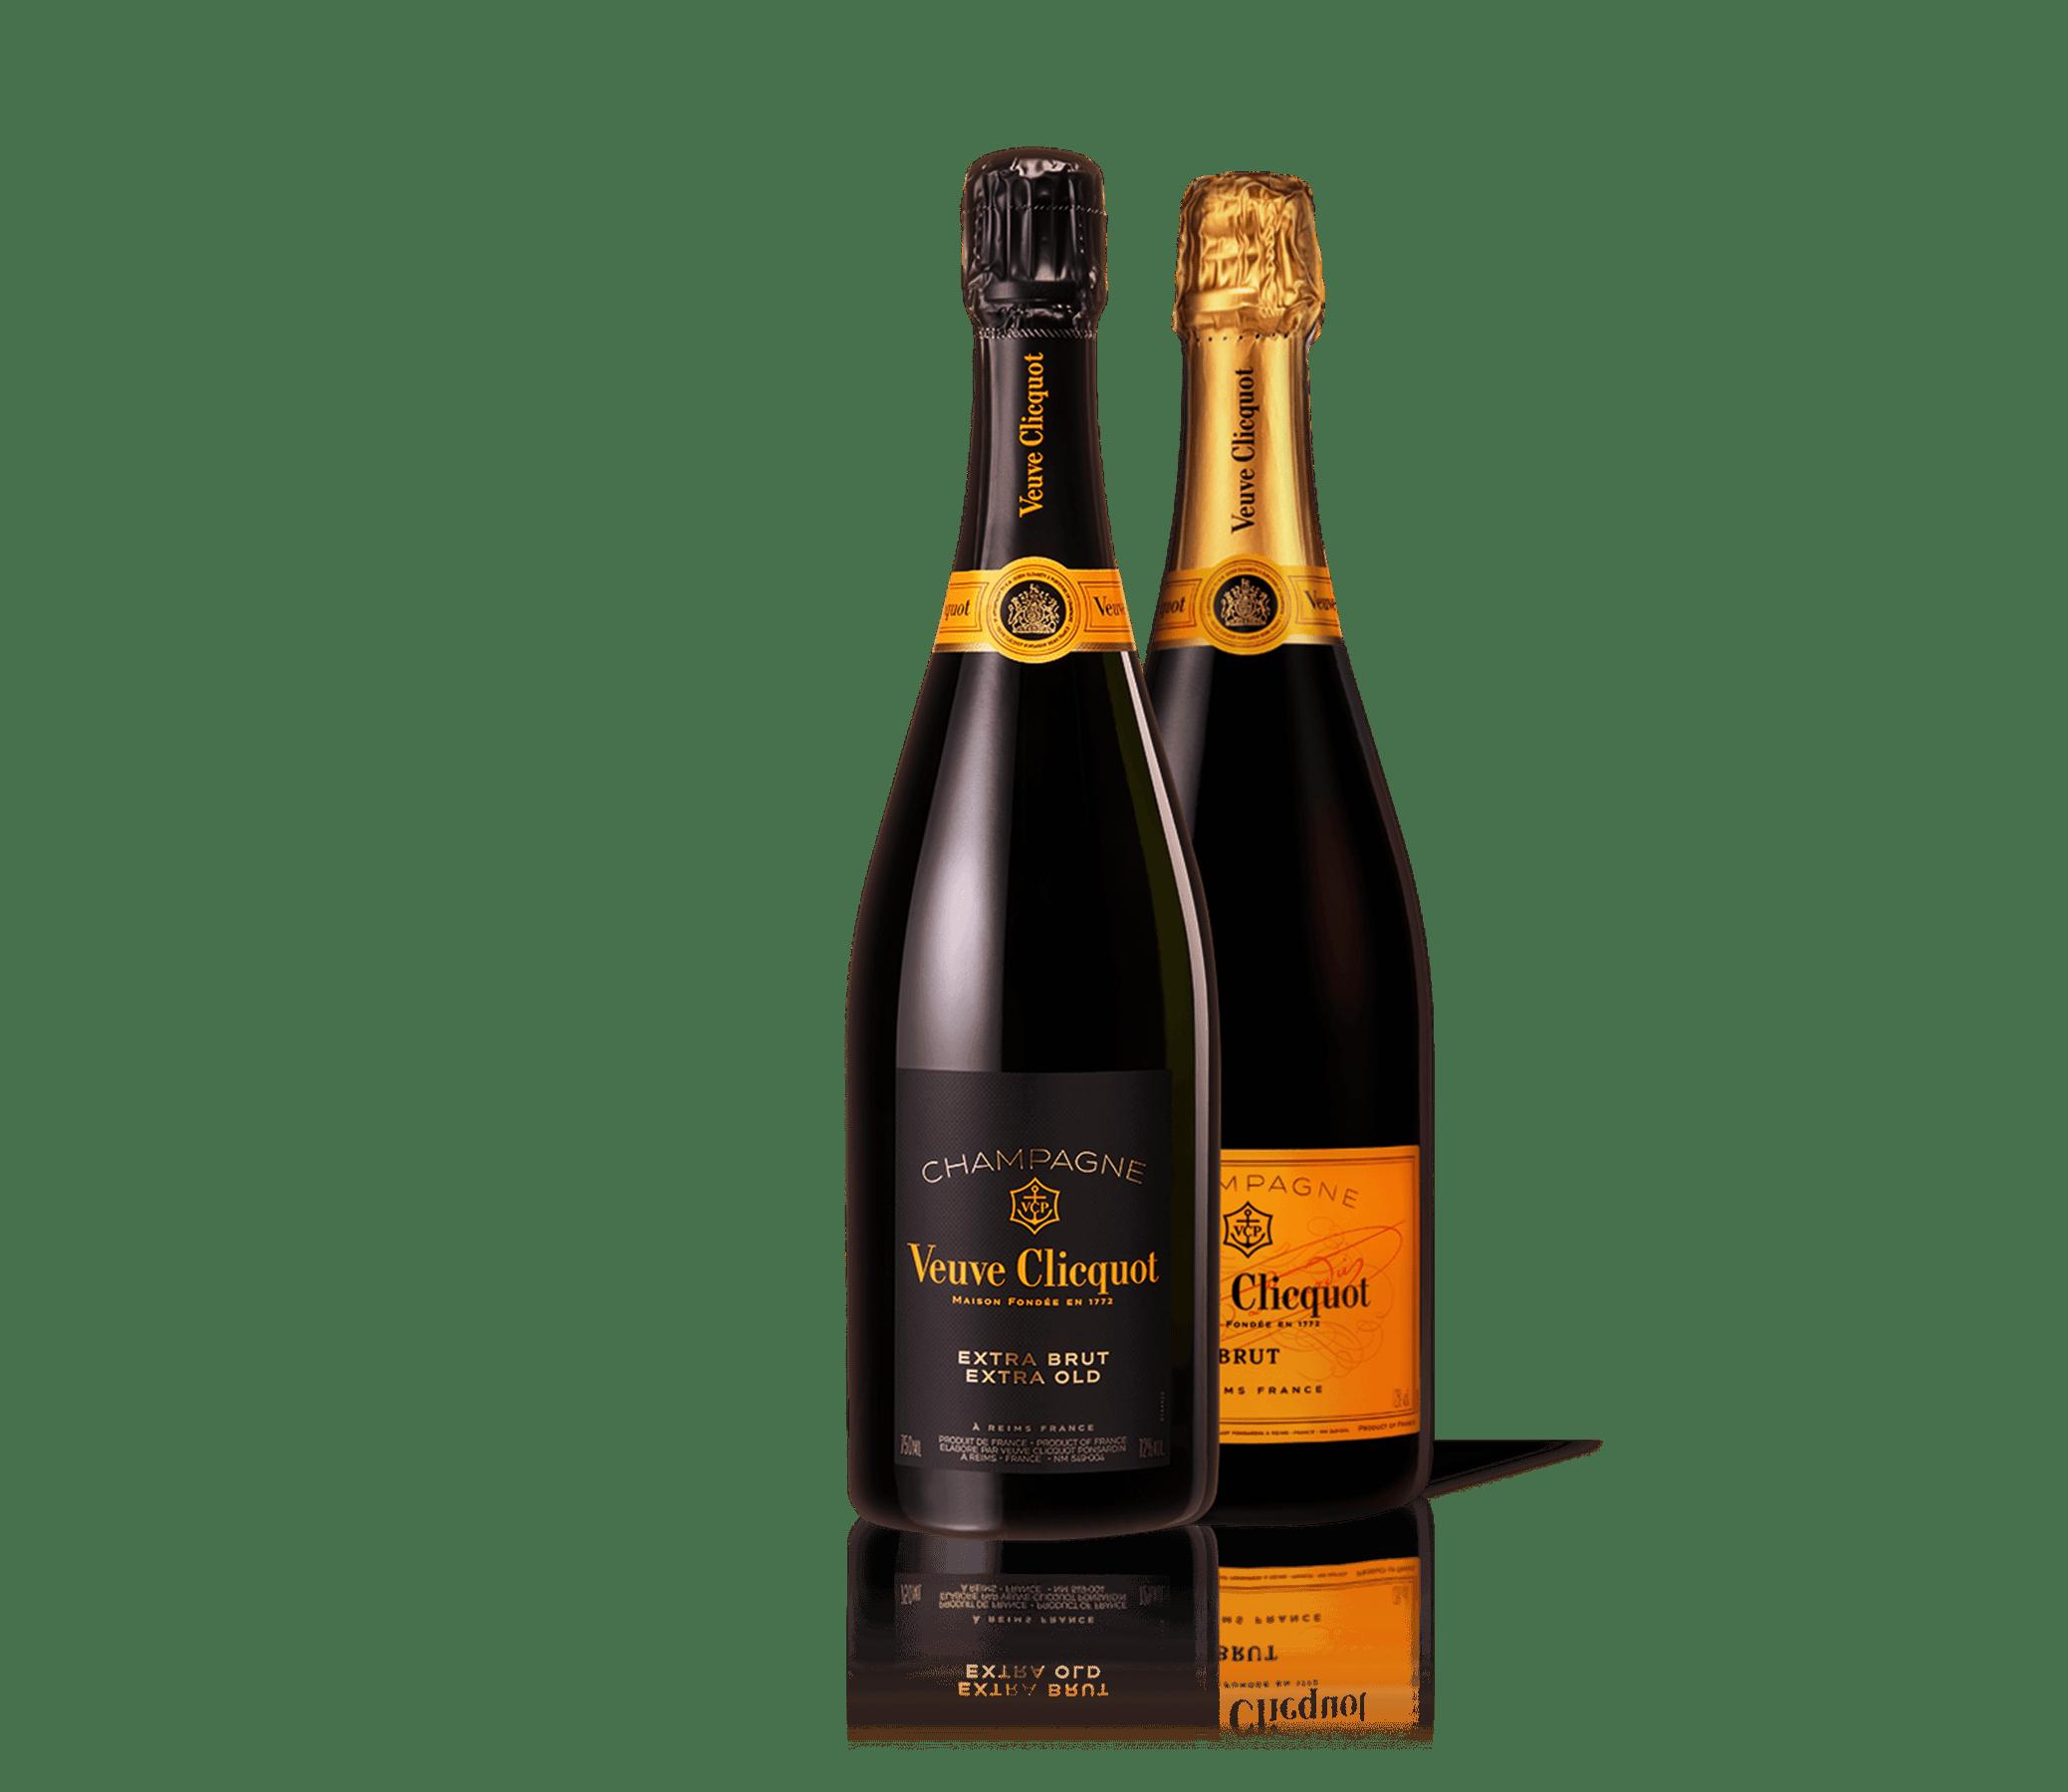 Garrafa do Champagne Veuve Clicquot Extra Brut Extra Old 1